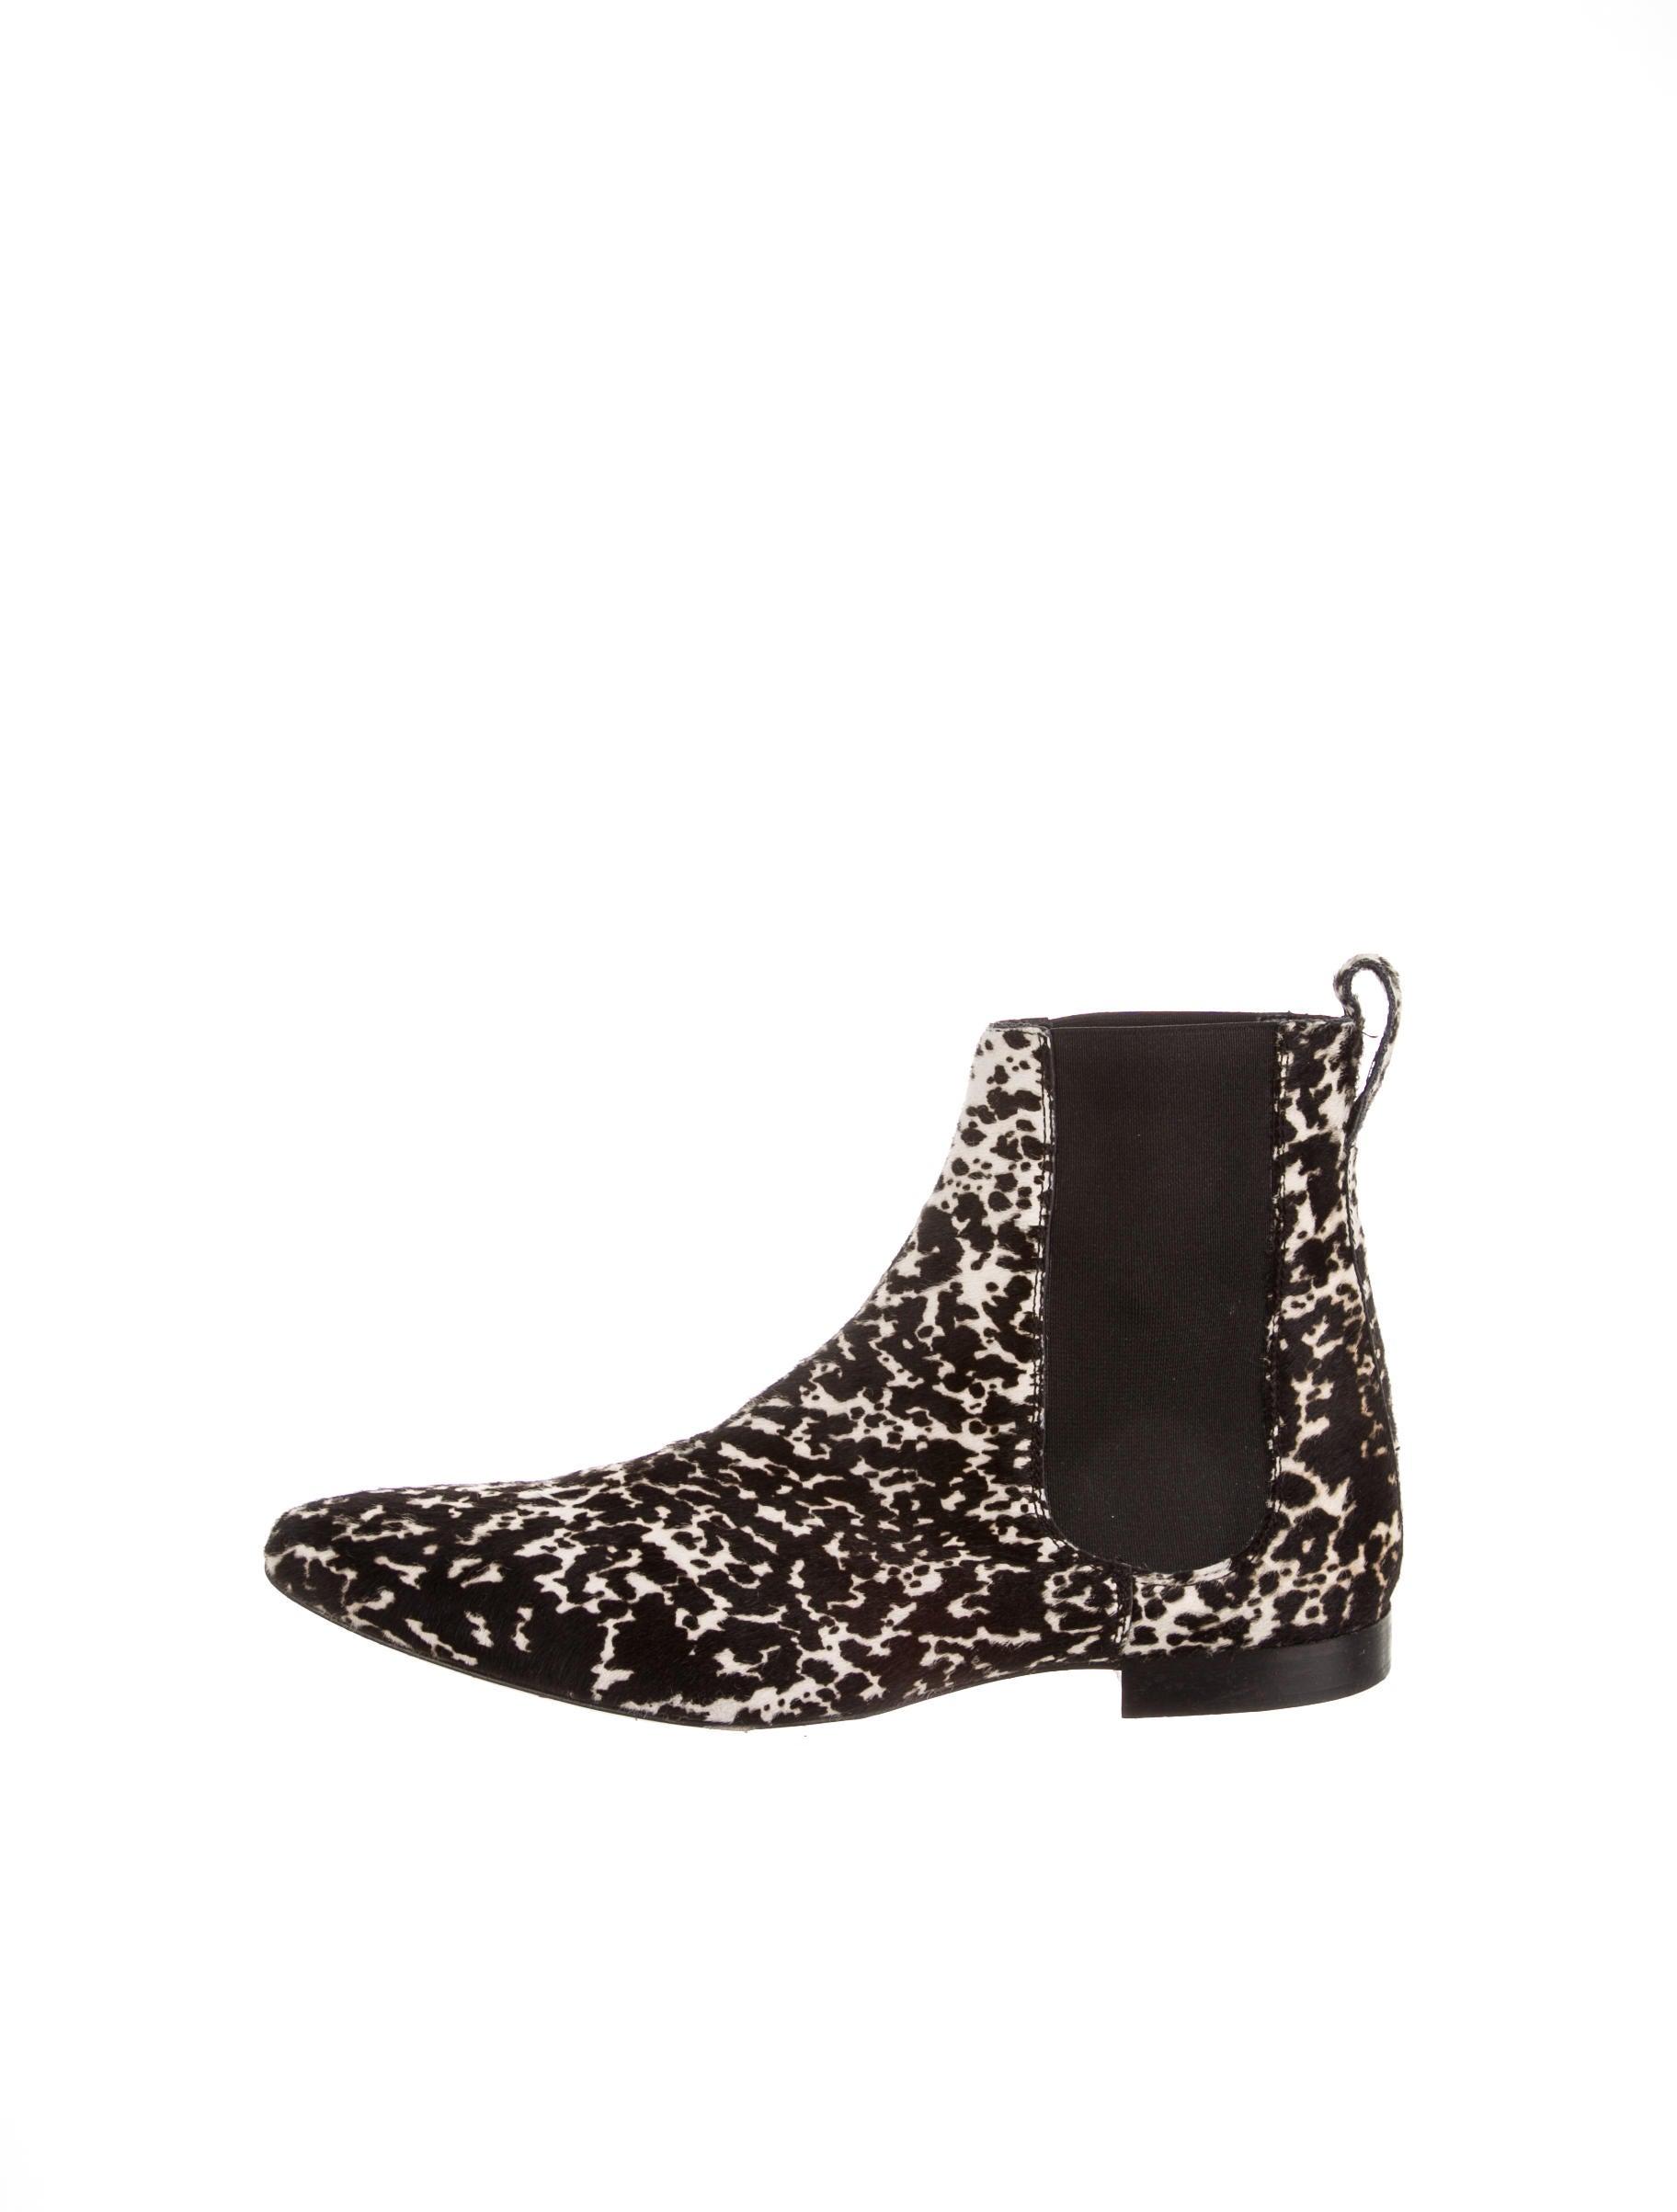 burberry prorsum chelsea boots mens shoes buf20881